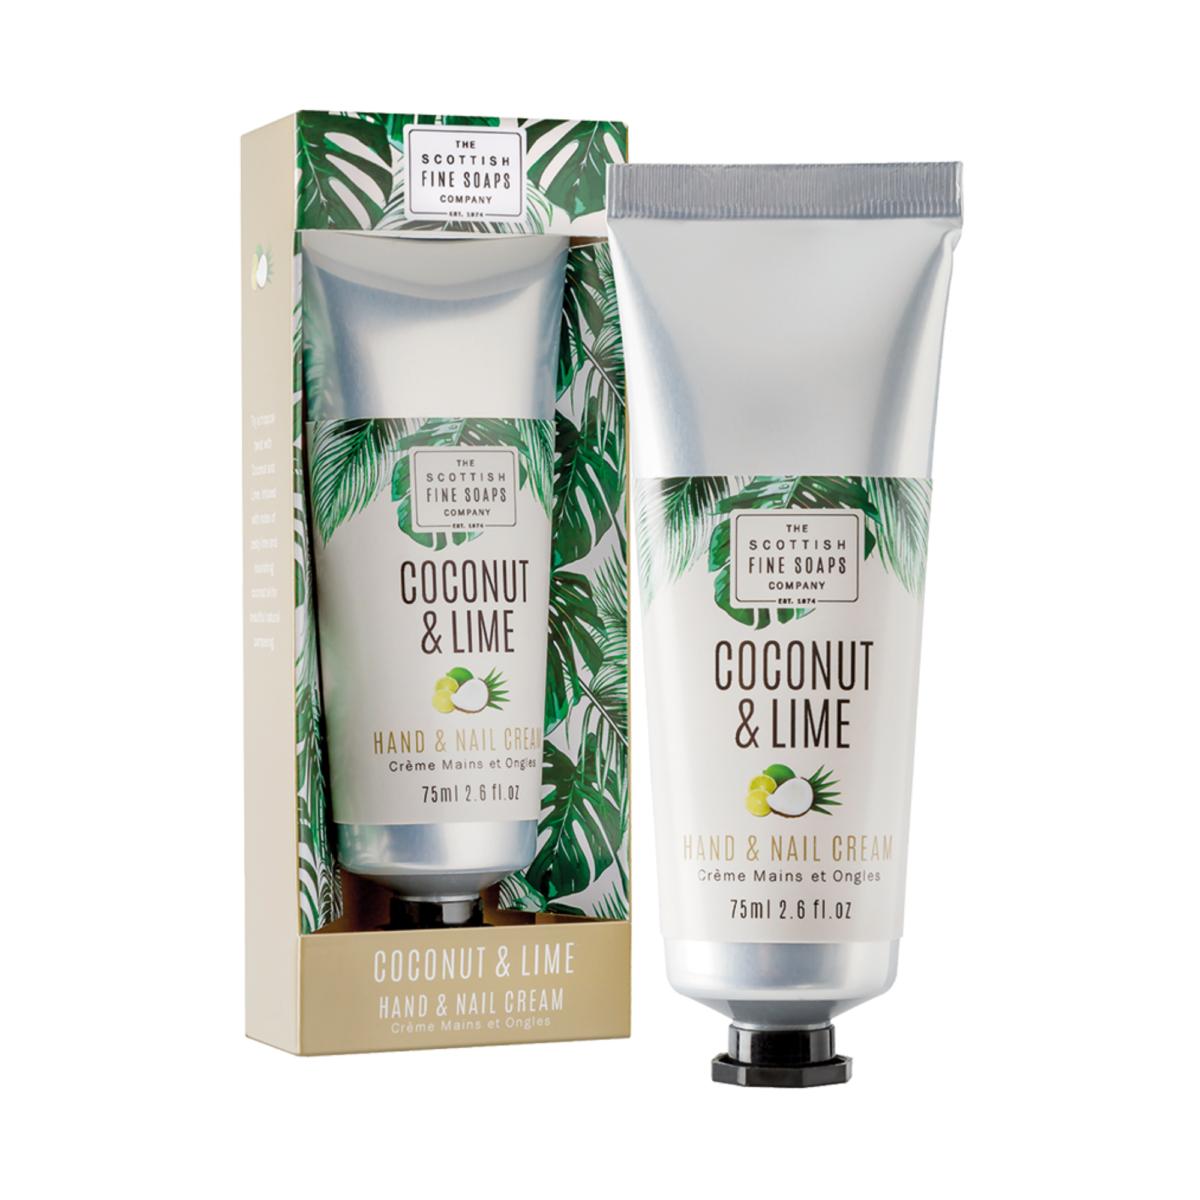 Coconut & Lime Hand & Nail Cream